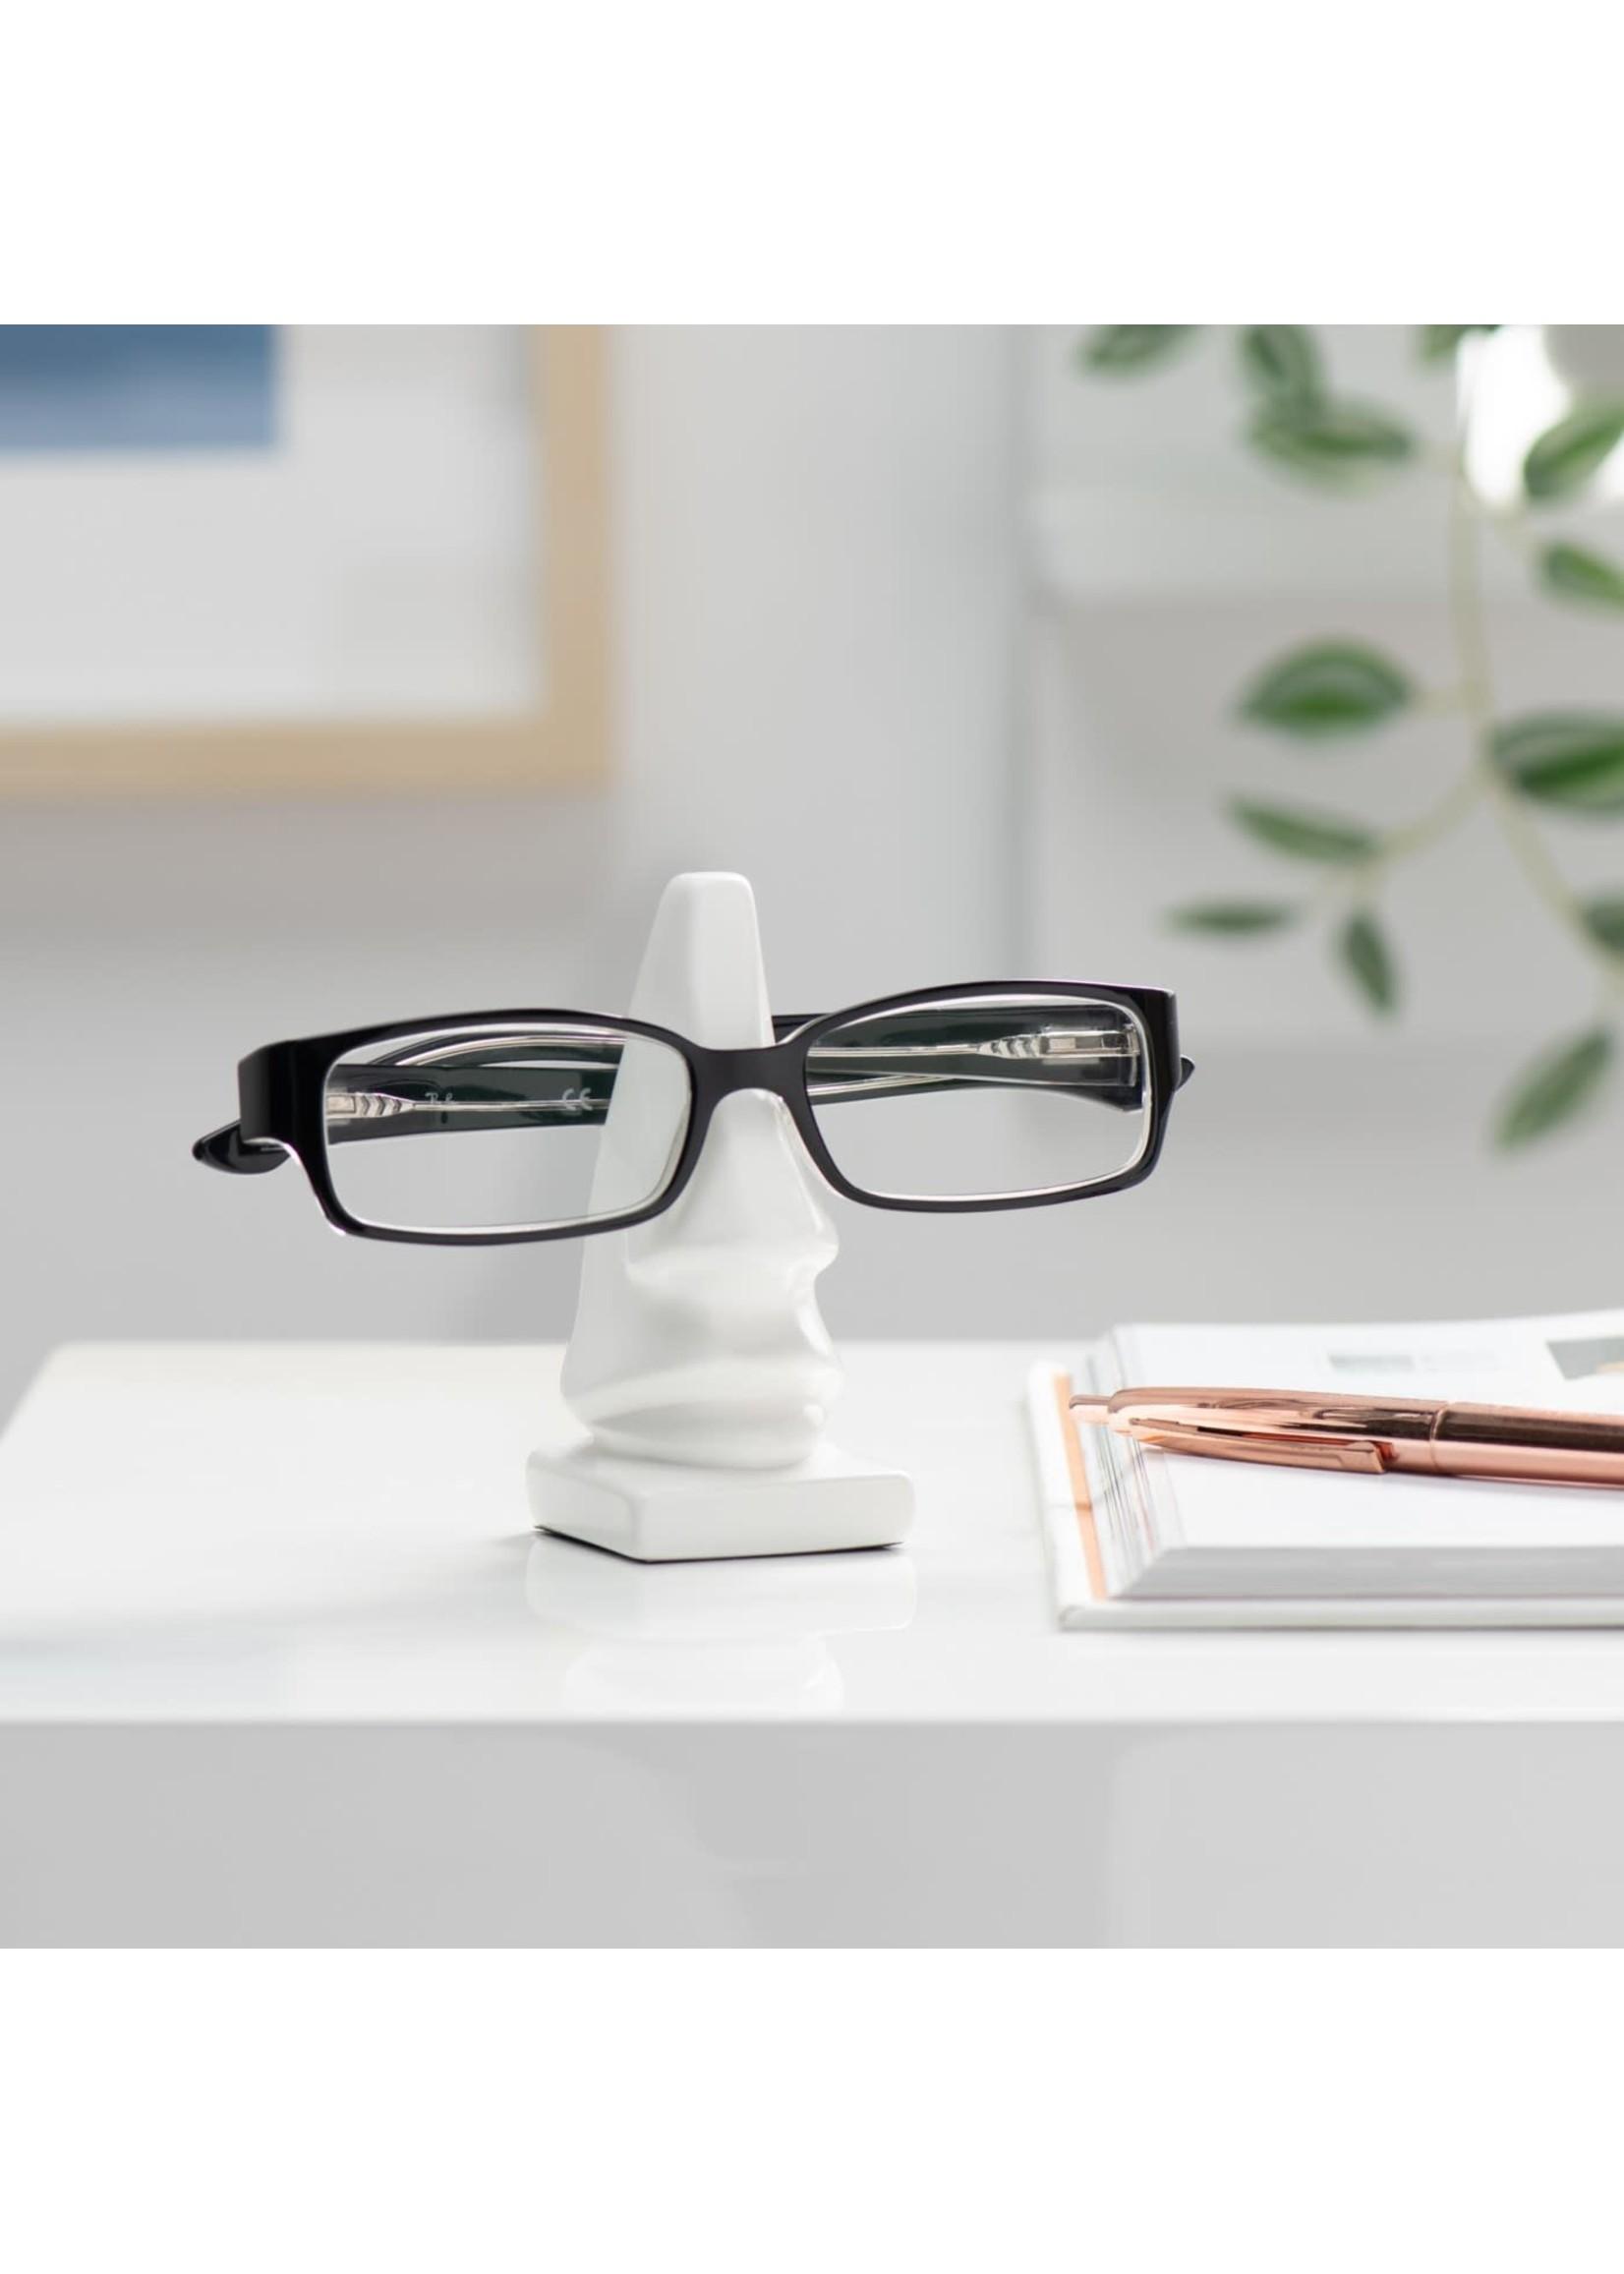 Torre & Tagus Leon Nose Eyeglass Holder - White